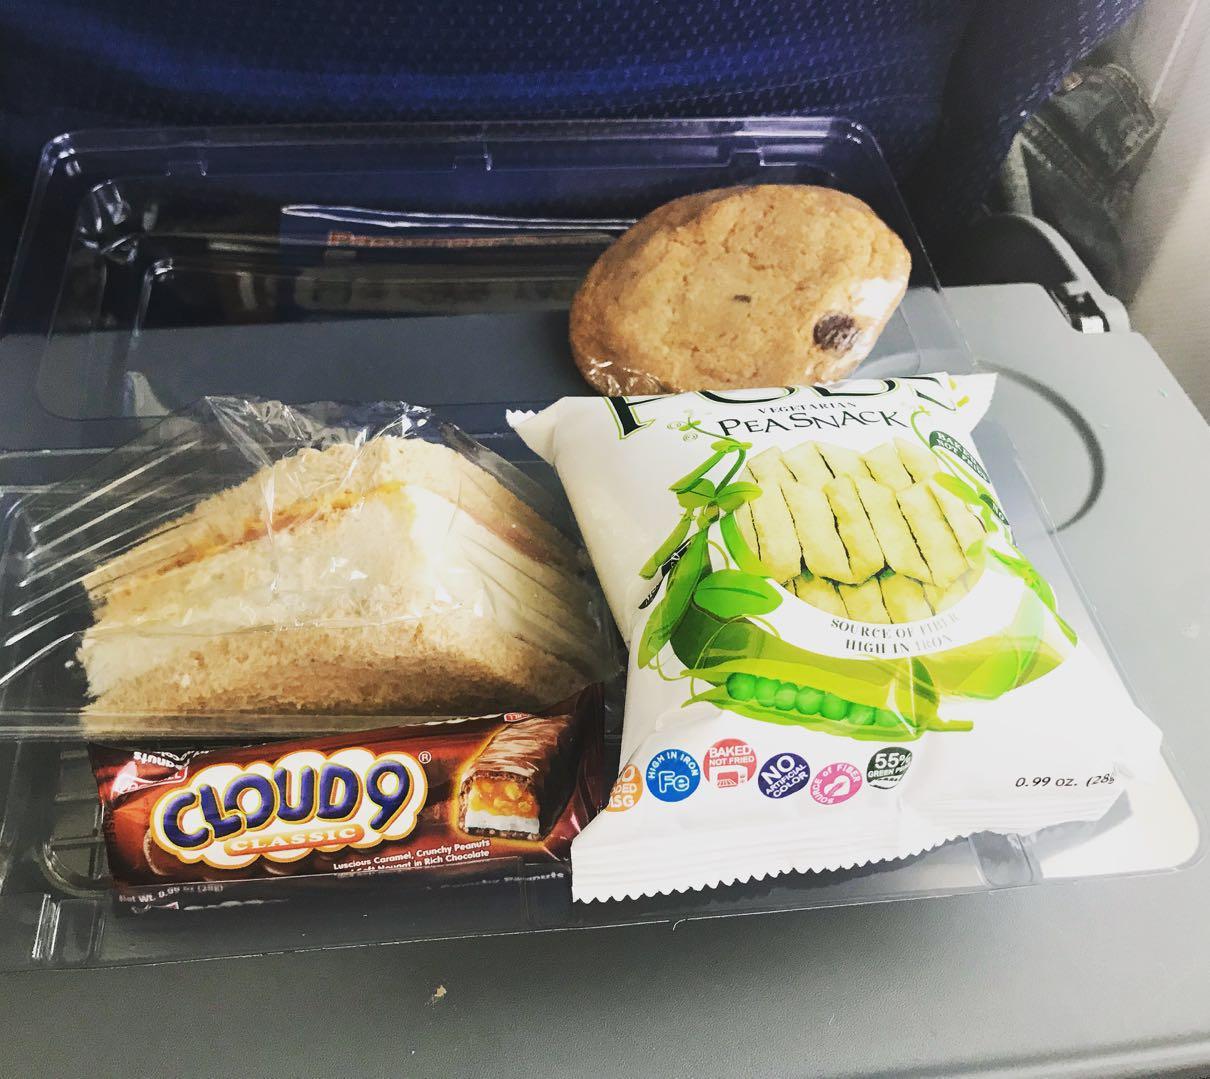 nauru pea snack and sandwich